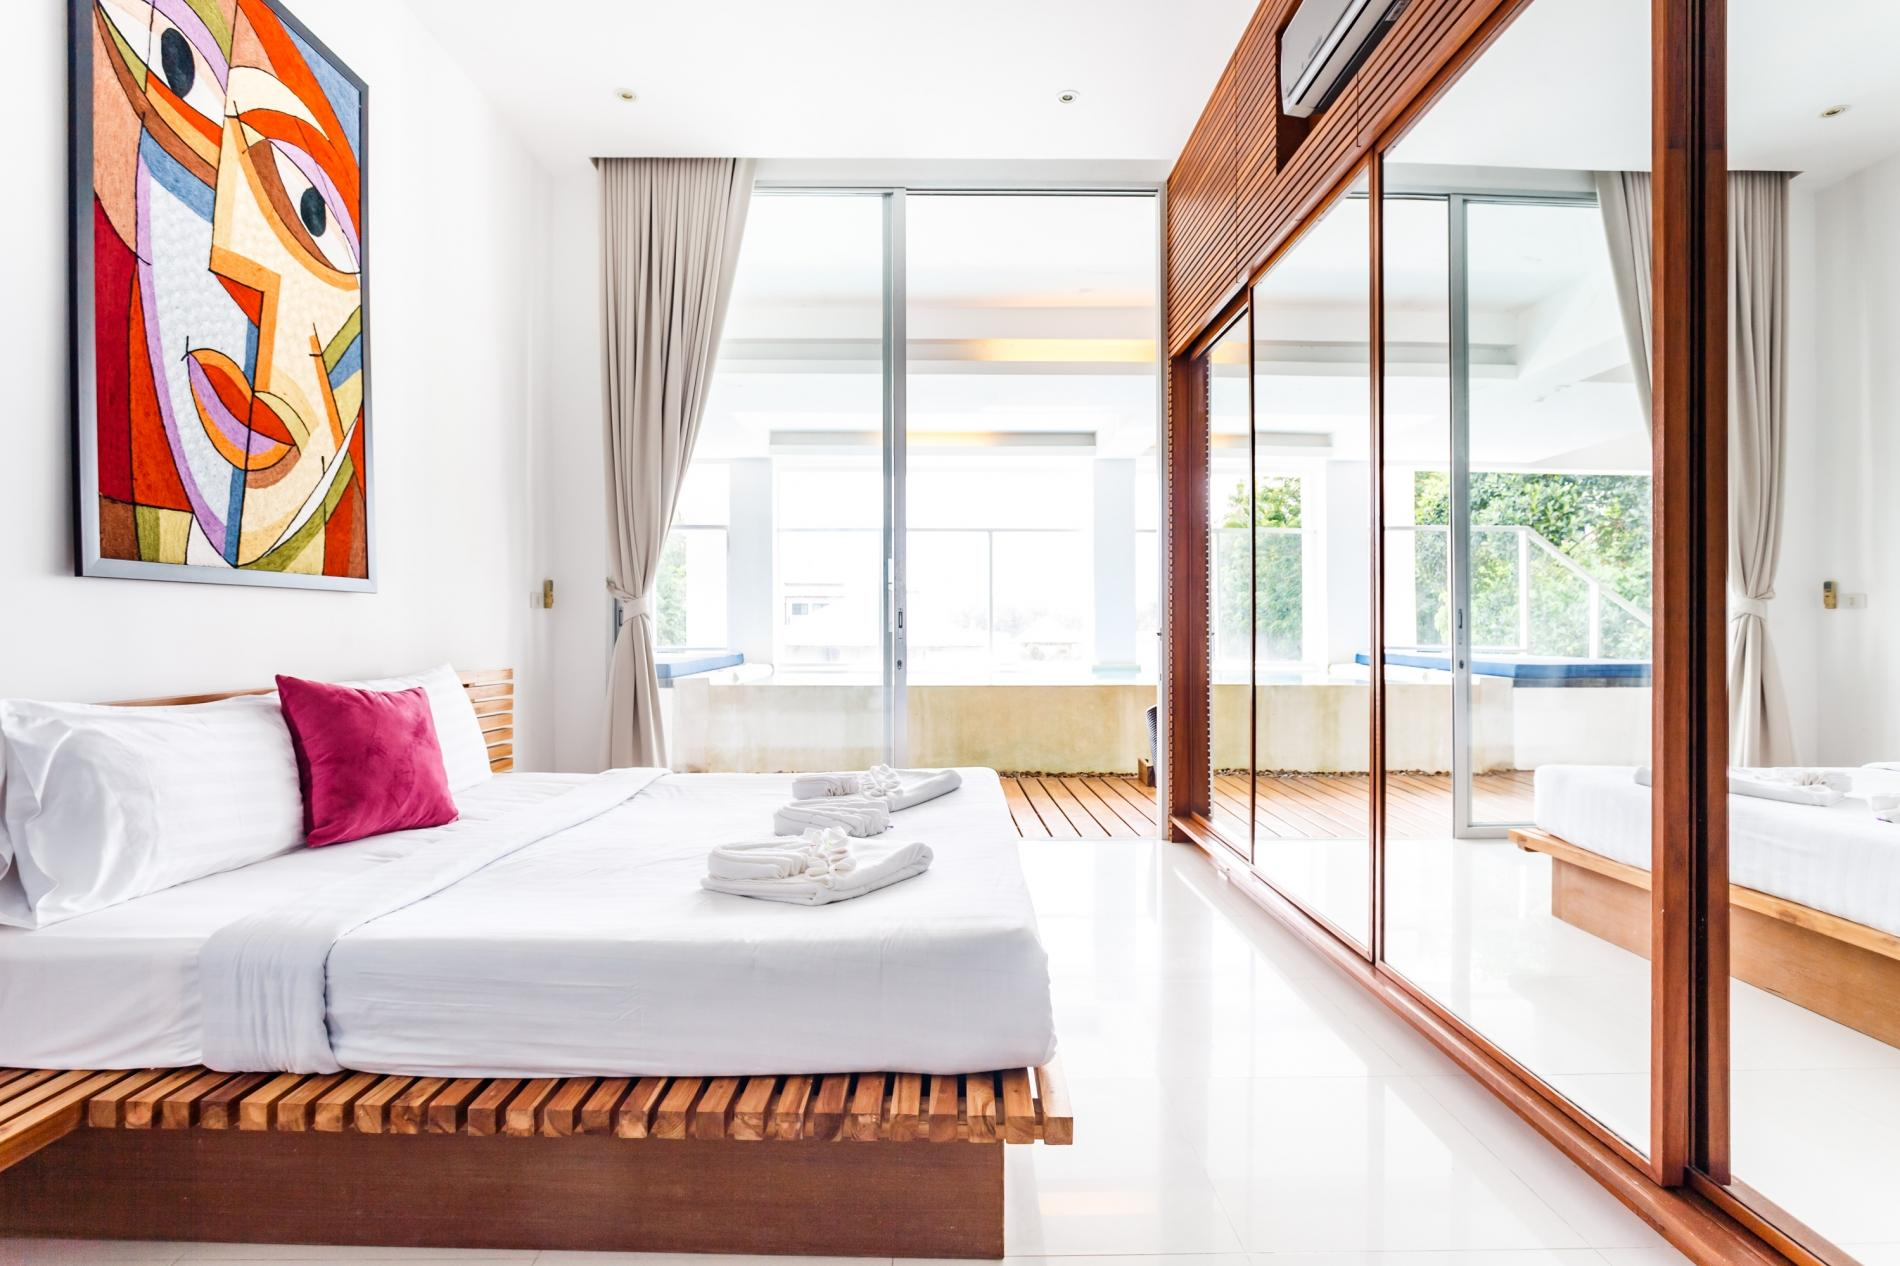 Apartment The Quarter 301 - Luxury Surin 3 bedroom apartment private pool photo 20318468